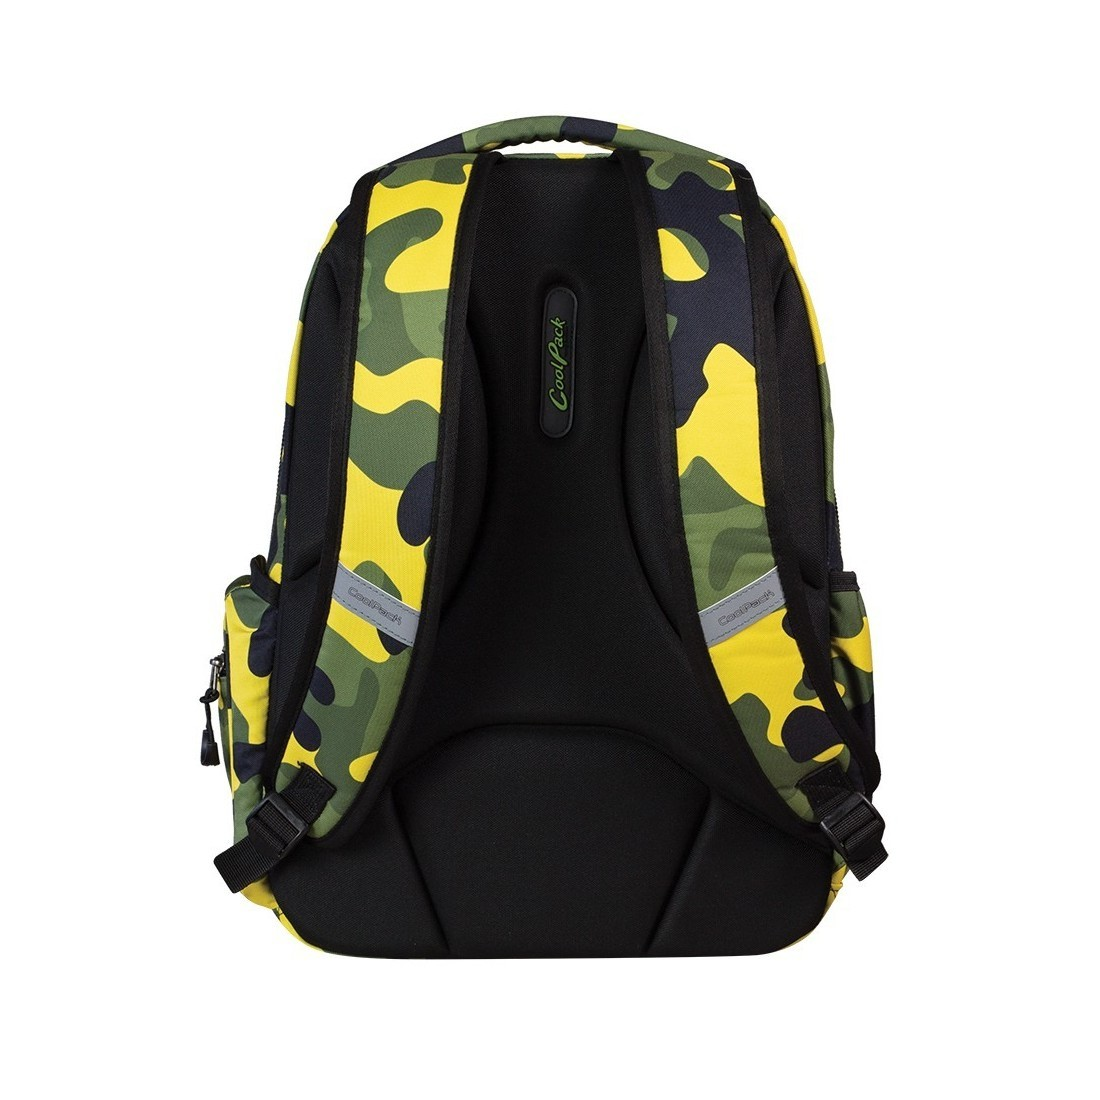 Plecak młodzieżowy COOLPACK BREAK MORO YELLOW CP 602 - plecak-tornister.pl